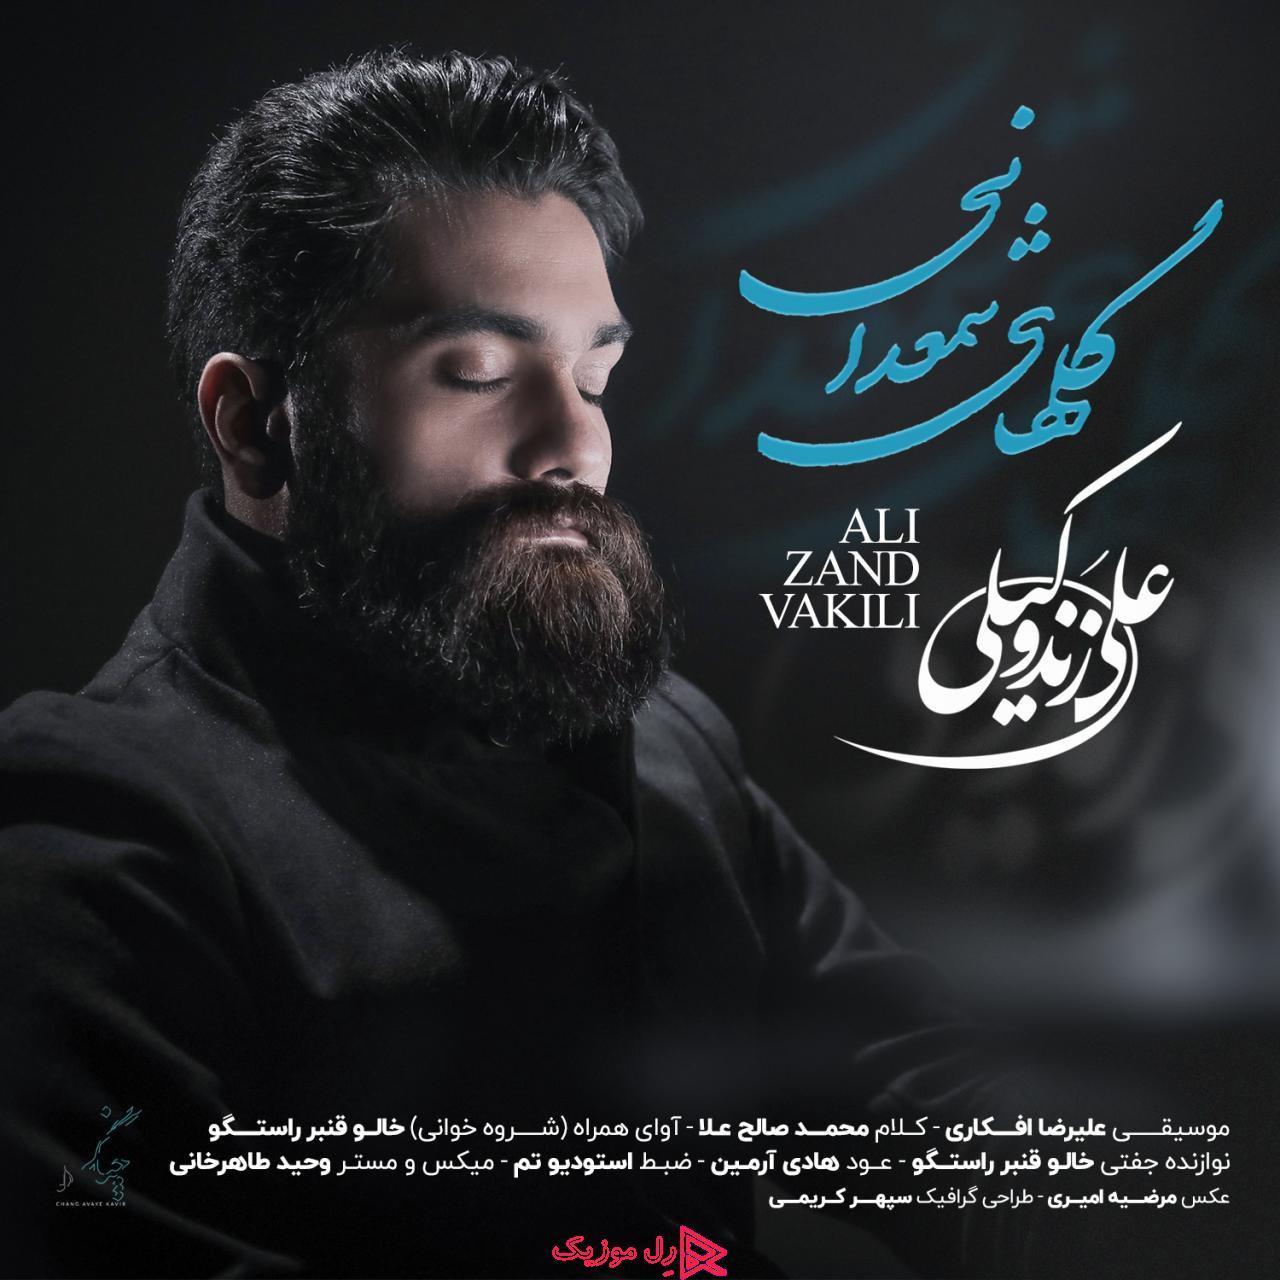 Ali Zand Vakili Golhaye Shamdani RellMusic - دانلود آهنگ علی زند وکیلی به نام گلهای شمعدانی